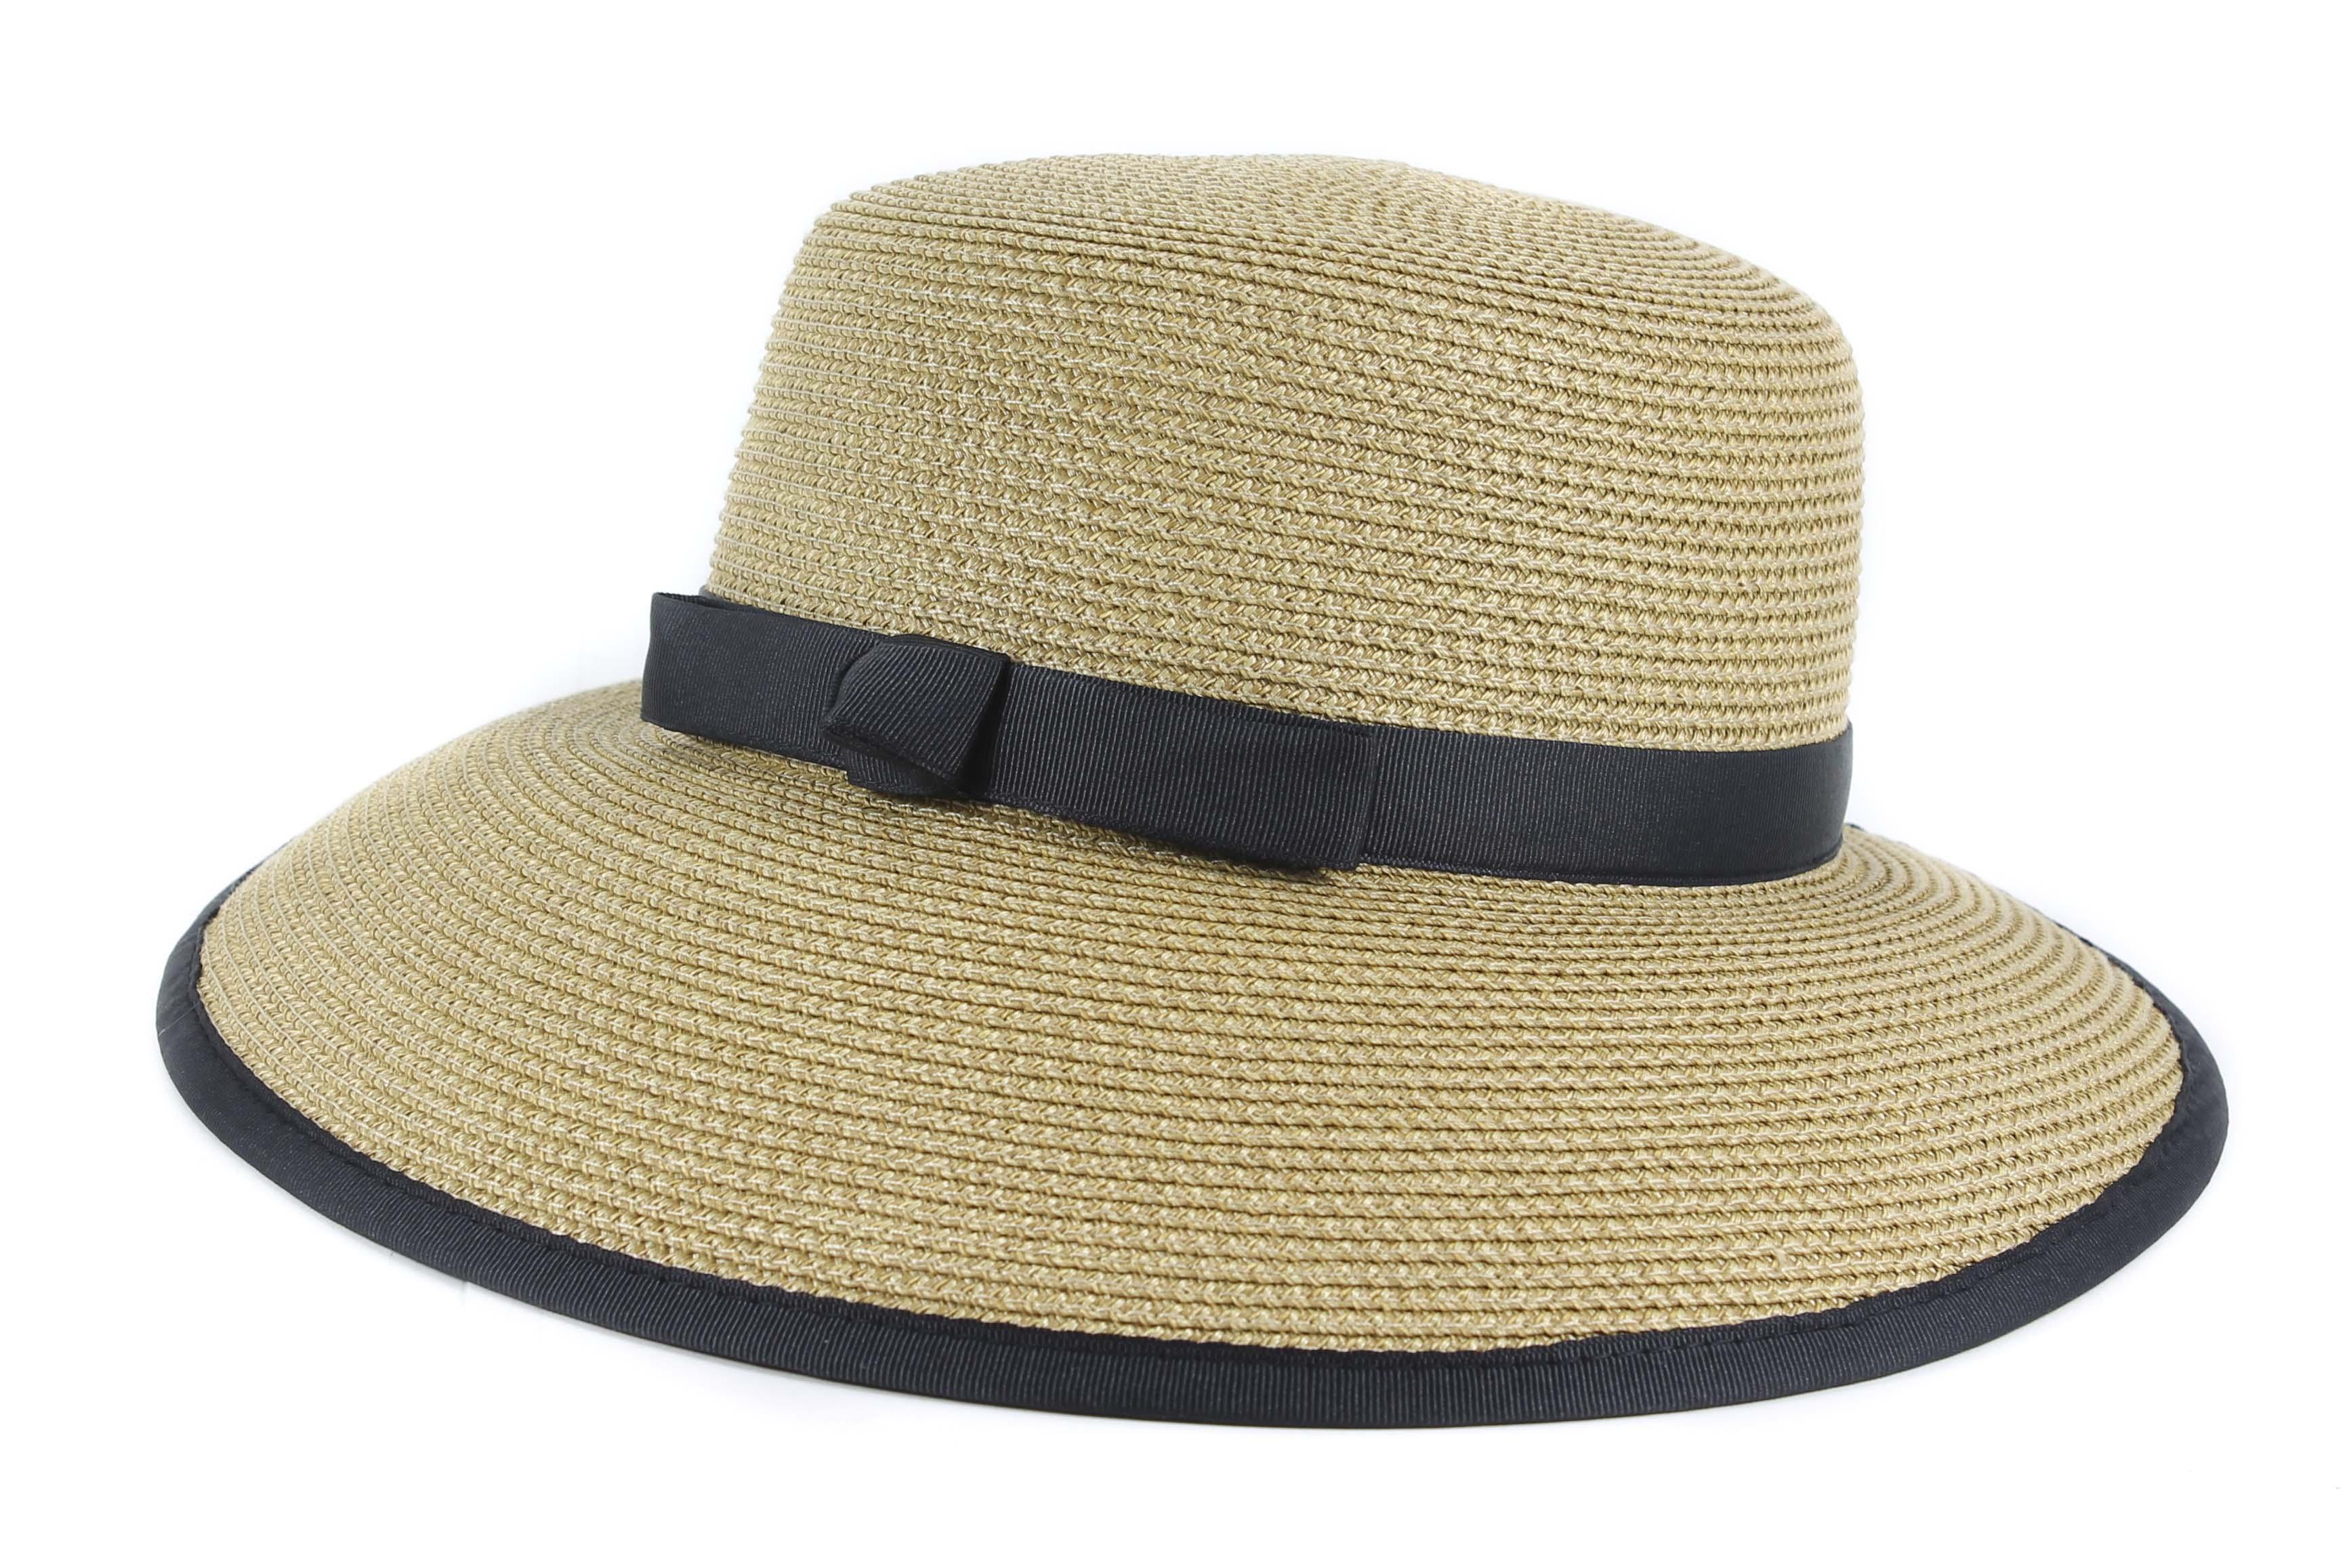 cb55daa756c Eric Javits Squishee Cap Natural Black Woven Hat New